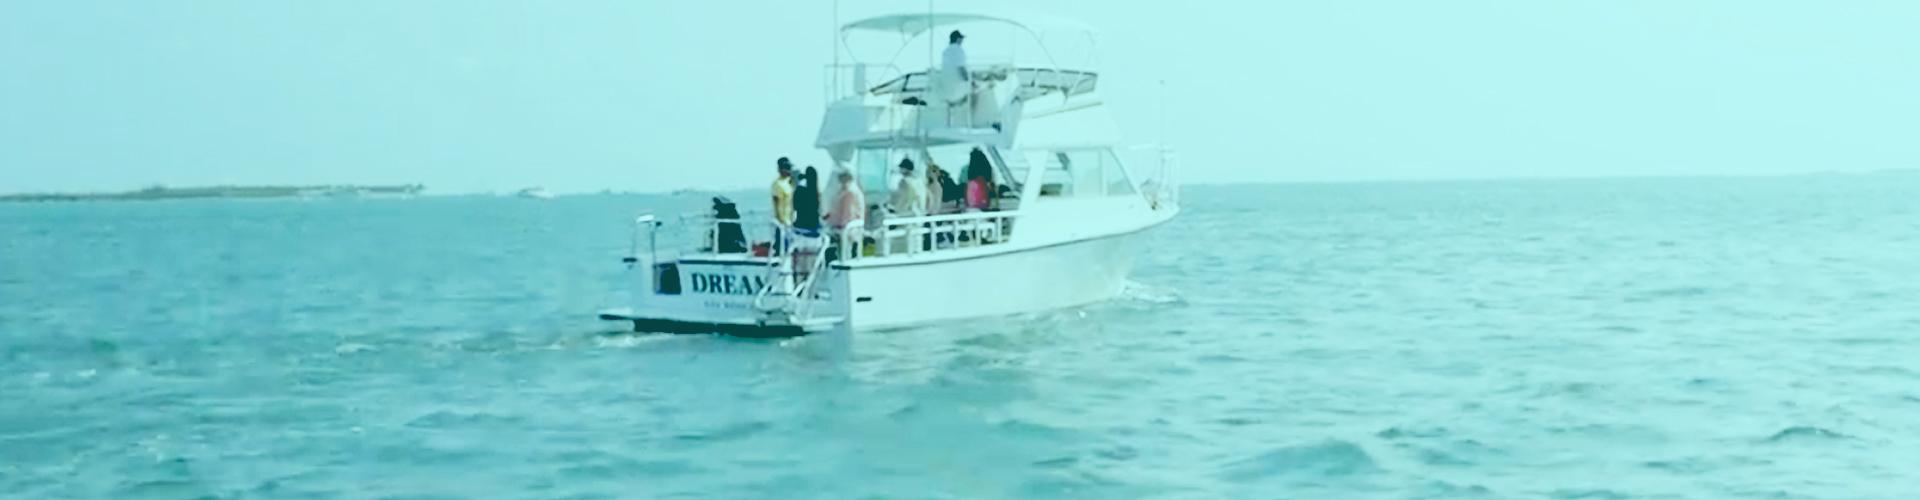 Key West Special Excursion